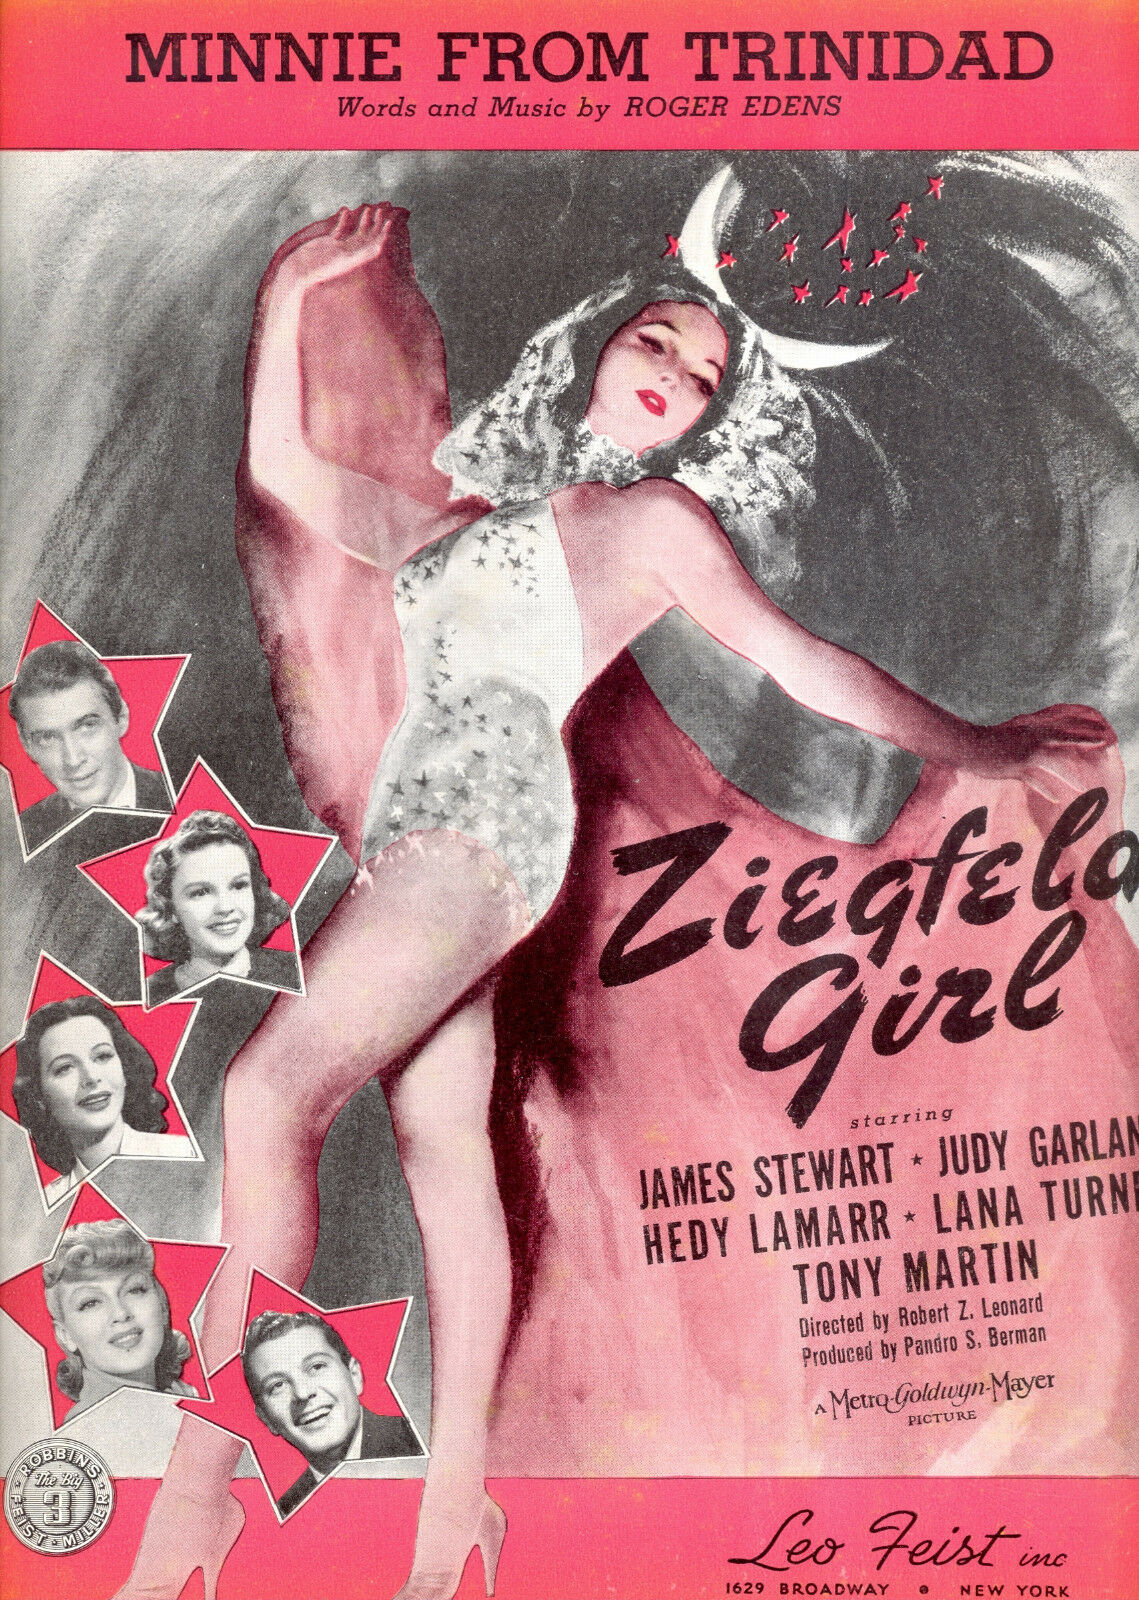 ZIEGFELD GIRL Sheet Music  Minnie From Trinidad  Judy Garland Lana Turner Hedy